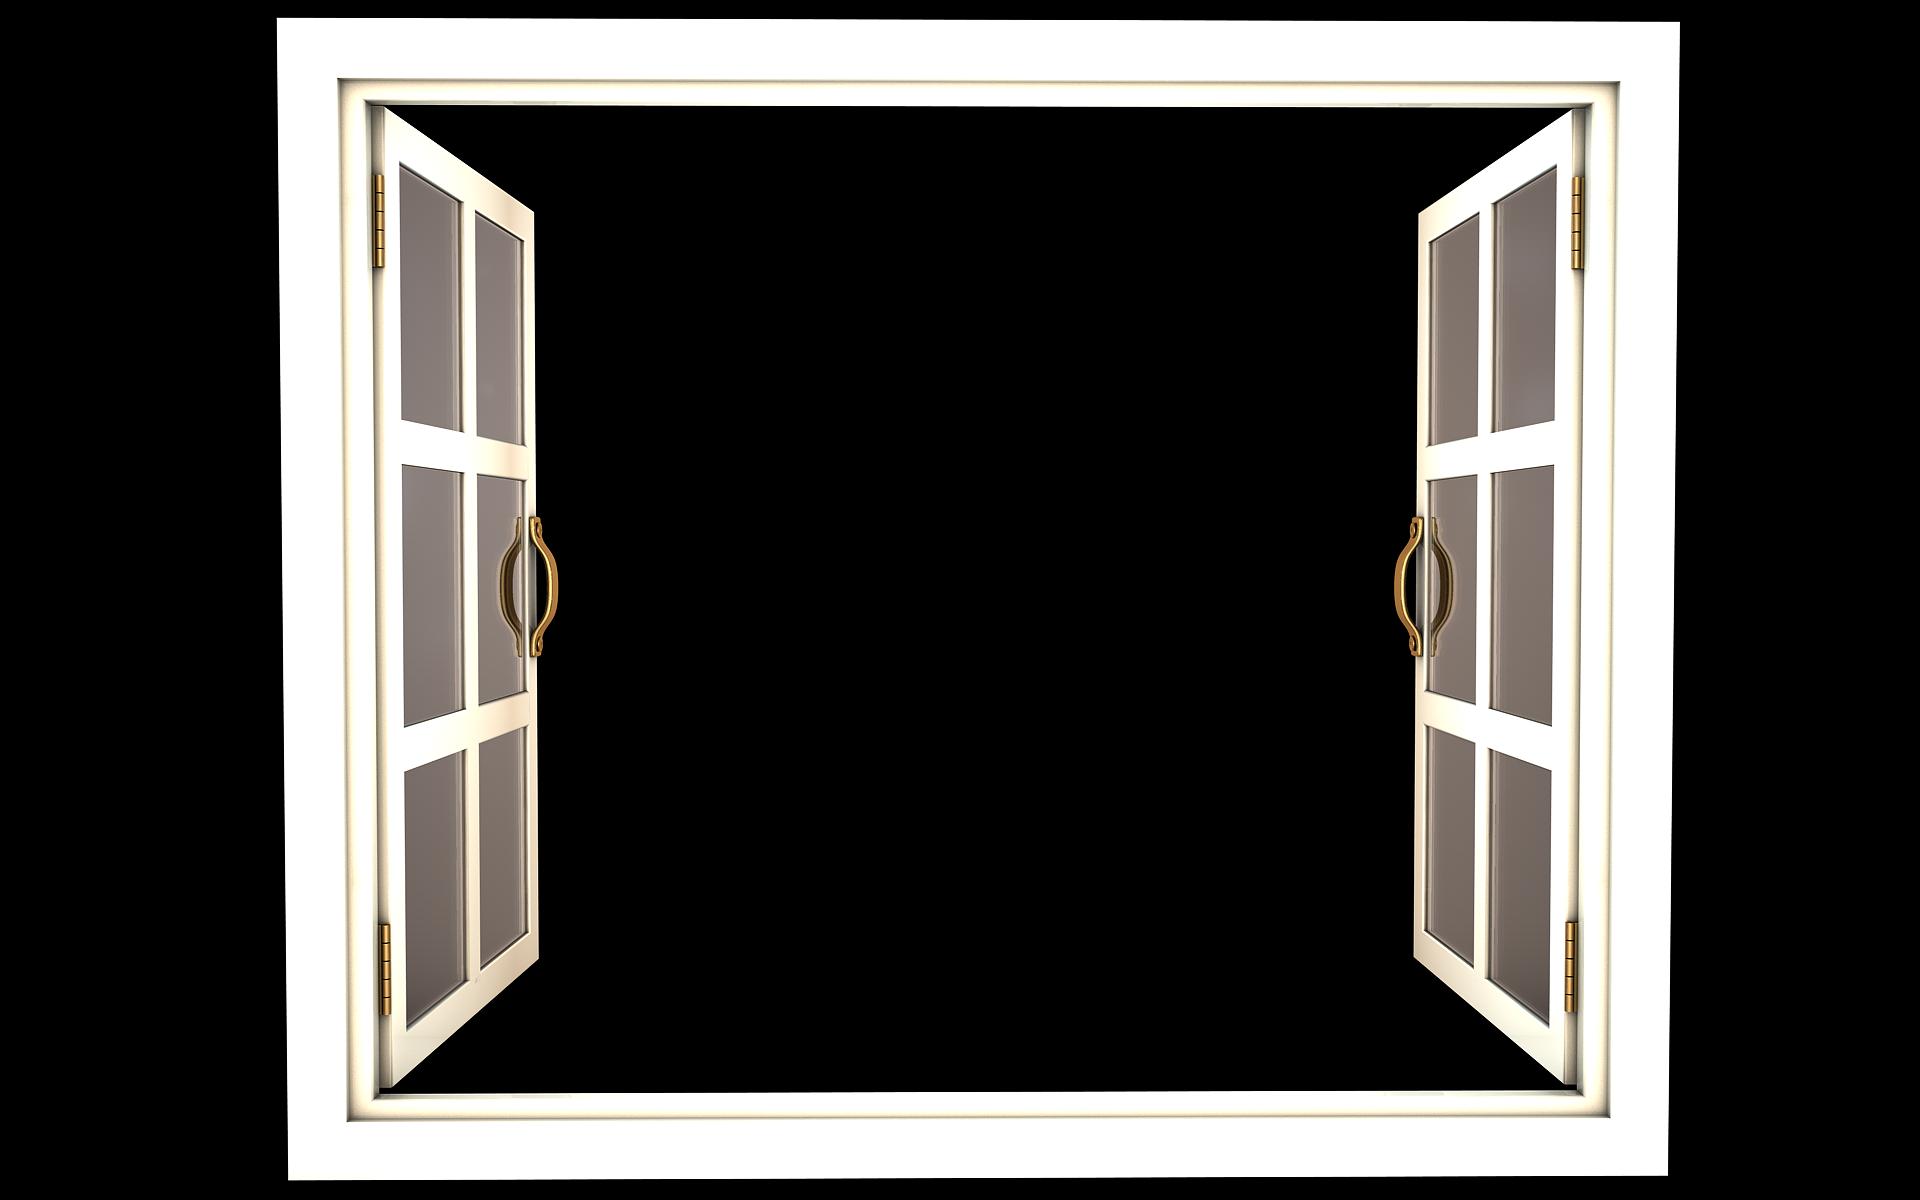 x png tfa. White clipart window frame